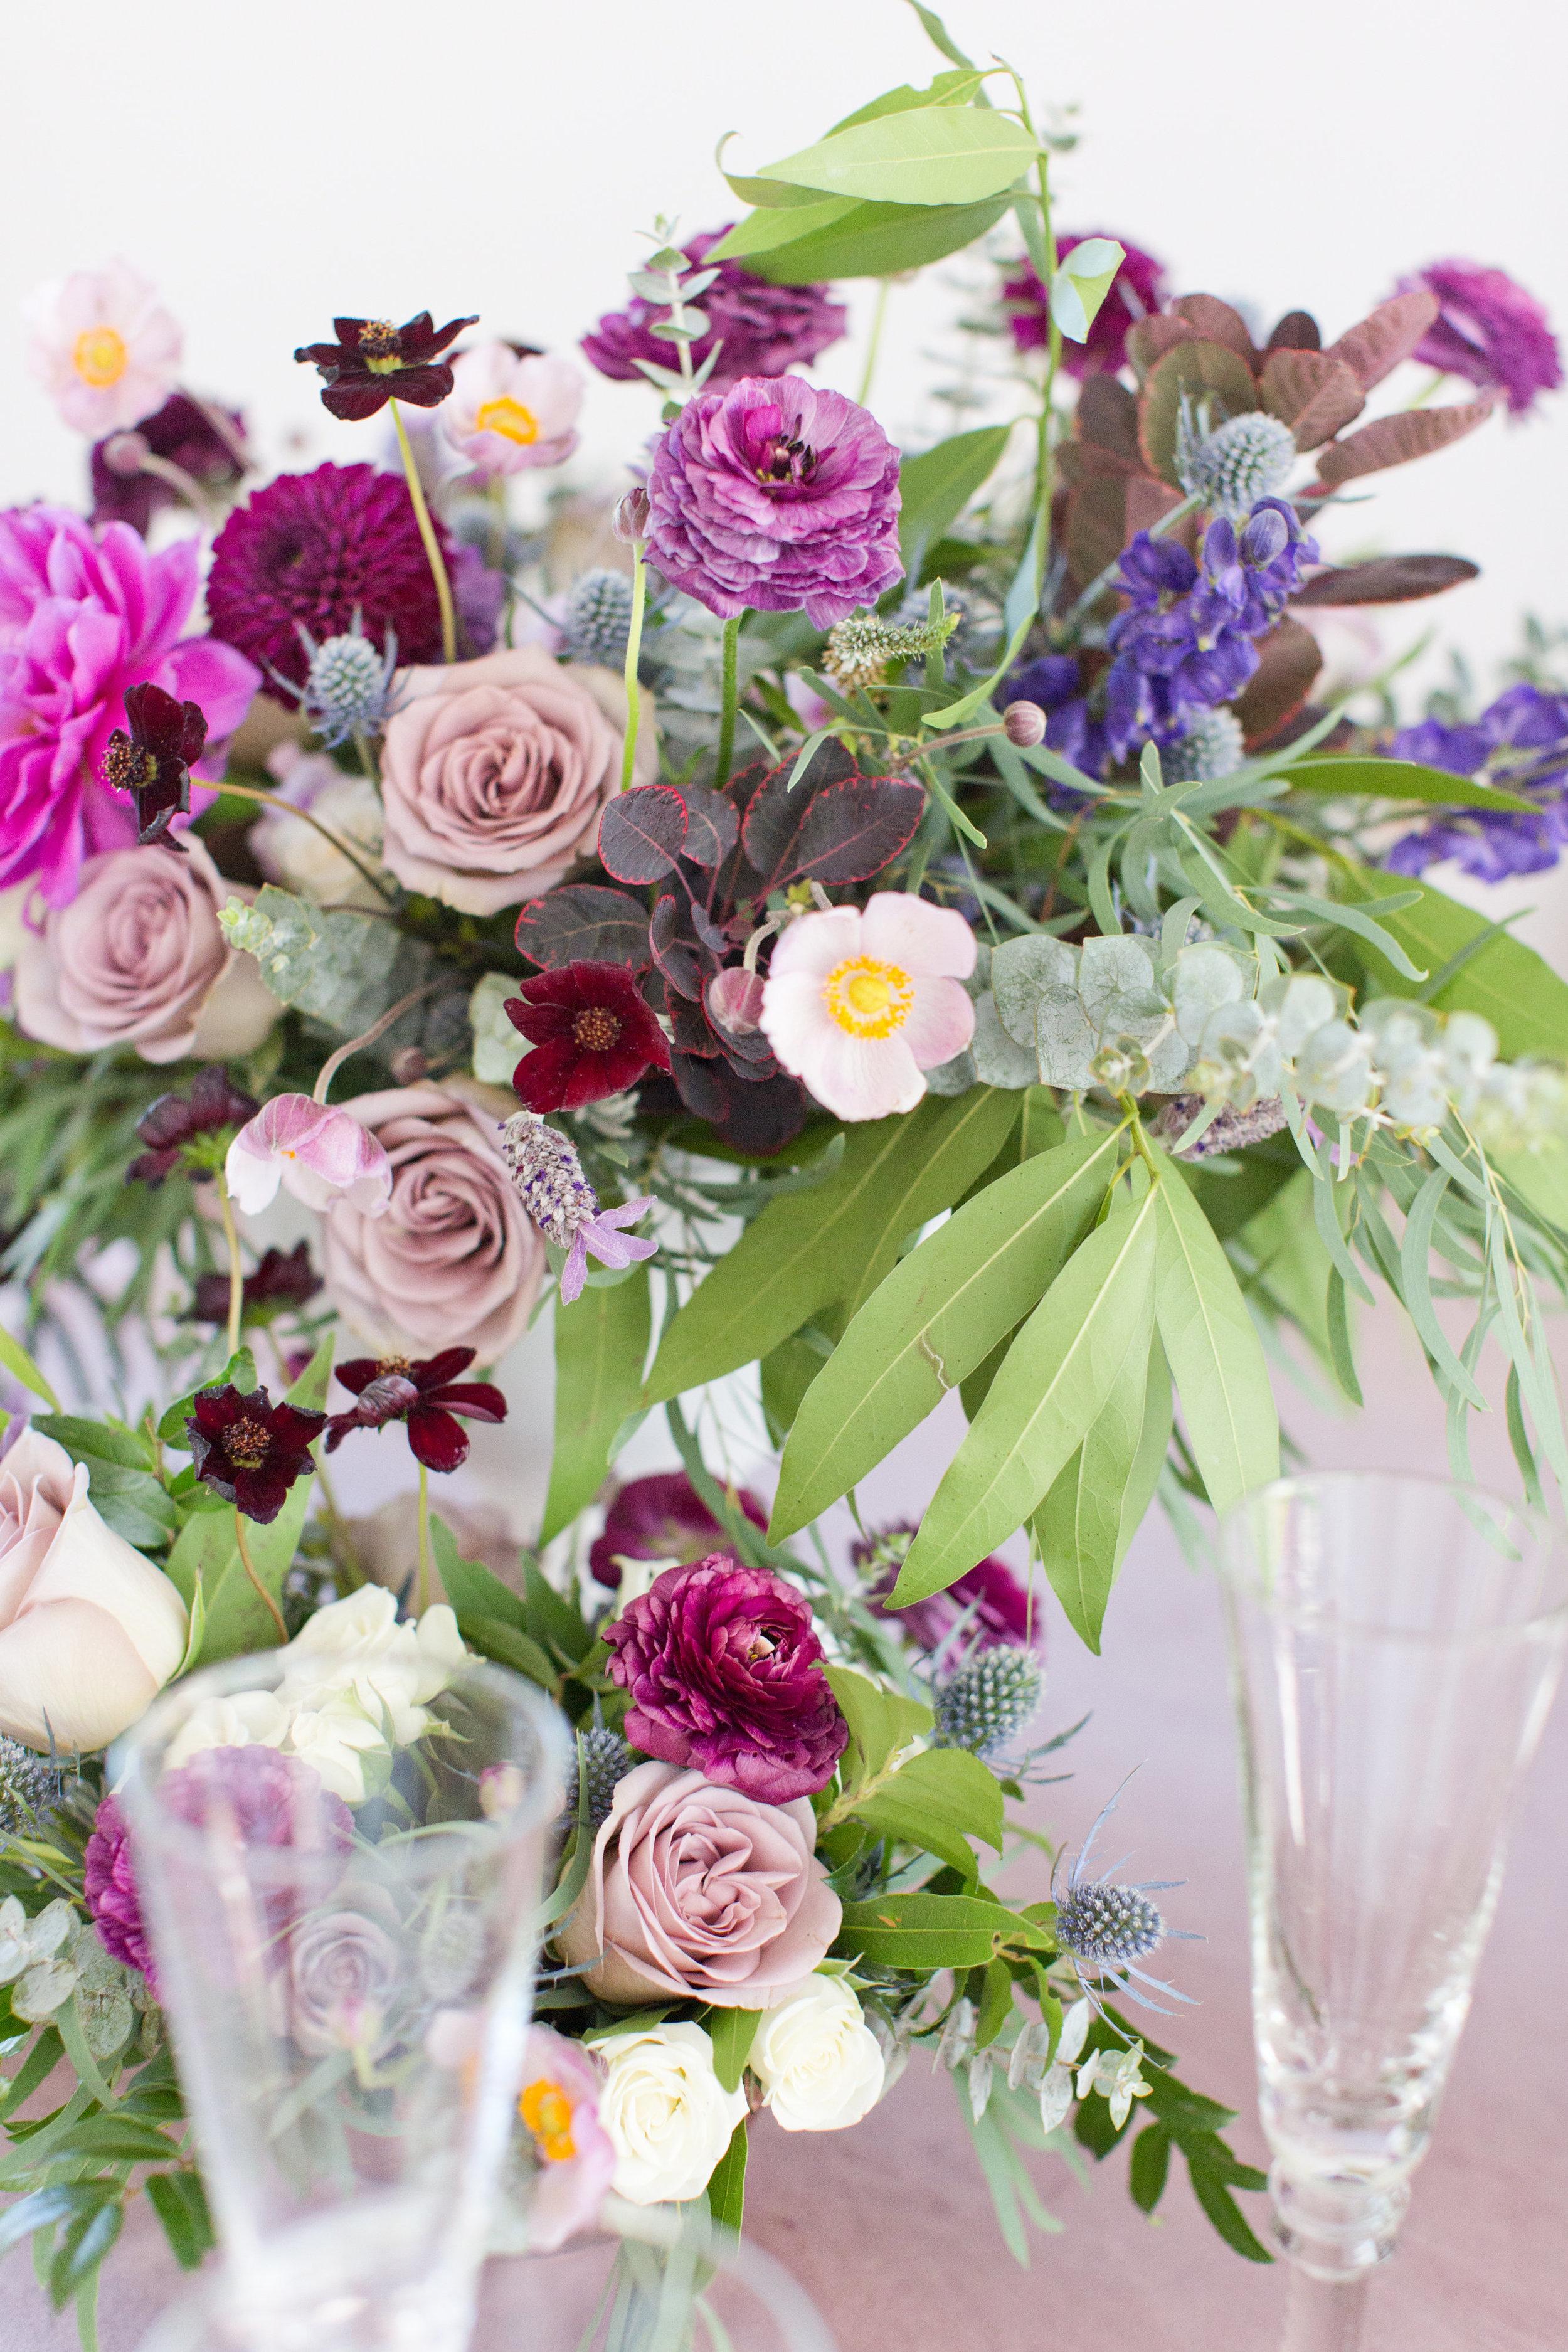 Amy & Jordan Workshop - Purple Anthropologie Inspired Wedding Centerpiece